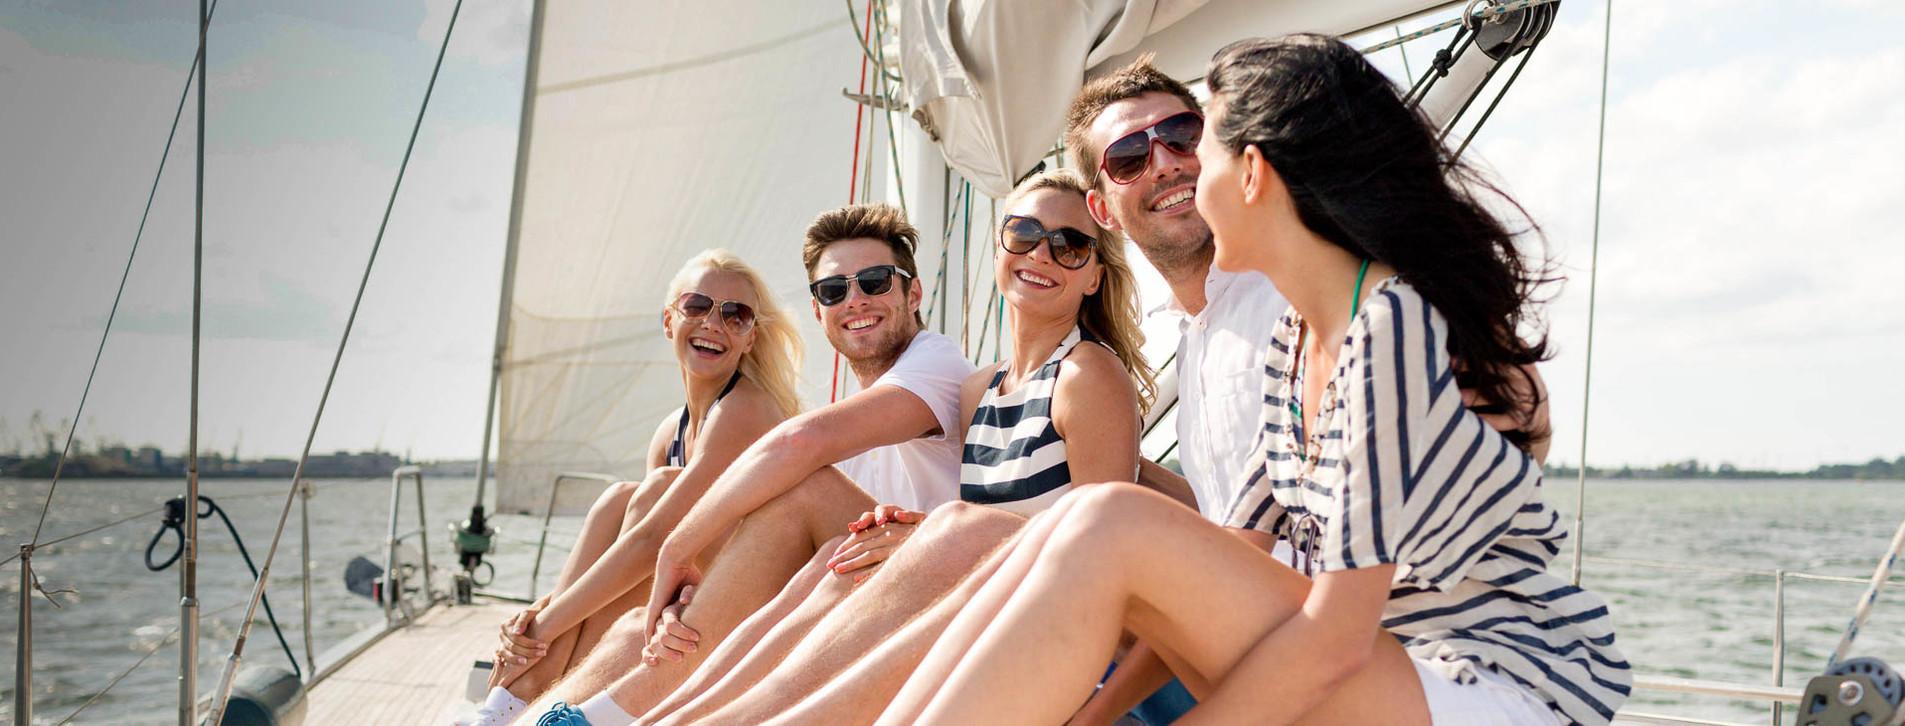 Фото - Велика яхта з друзями